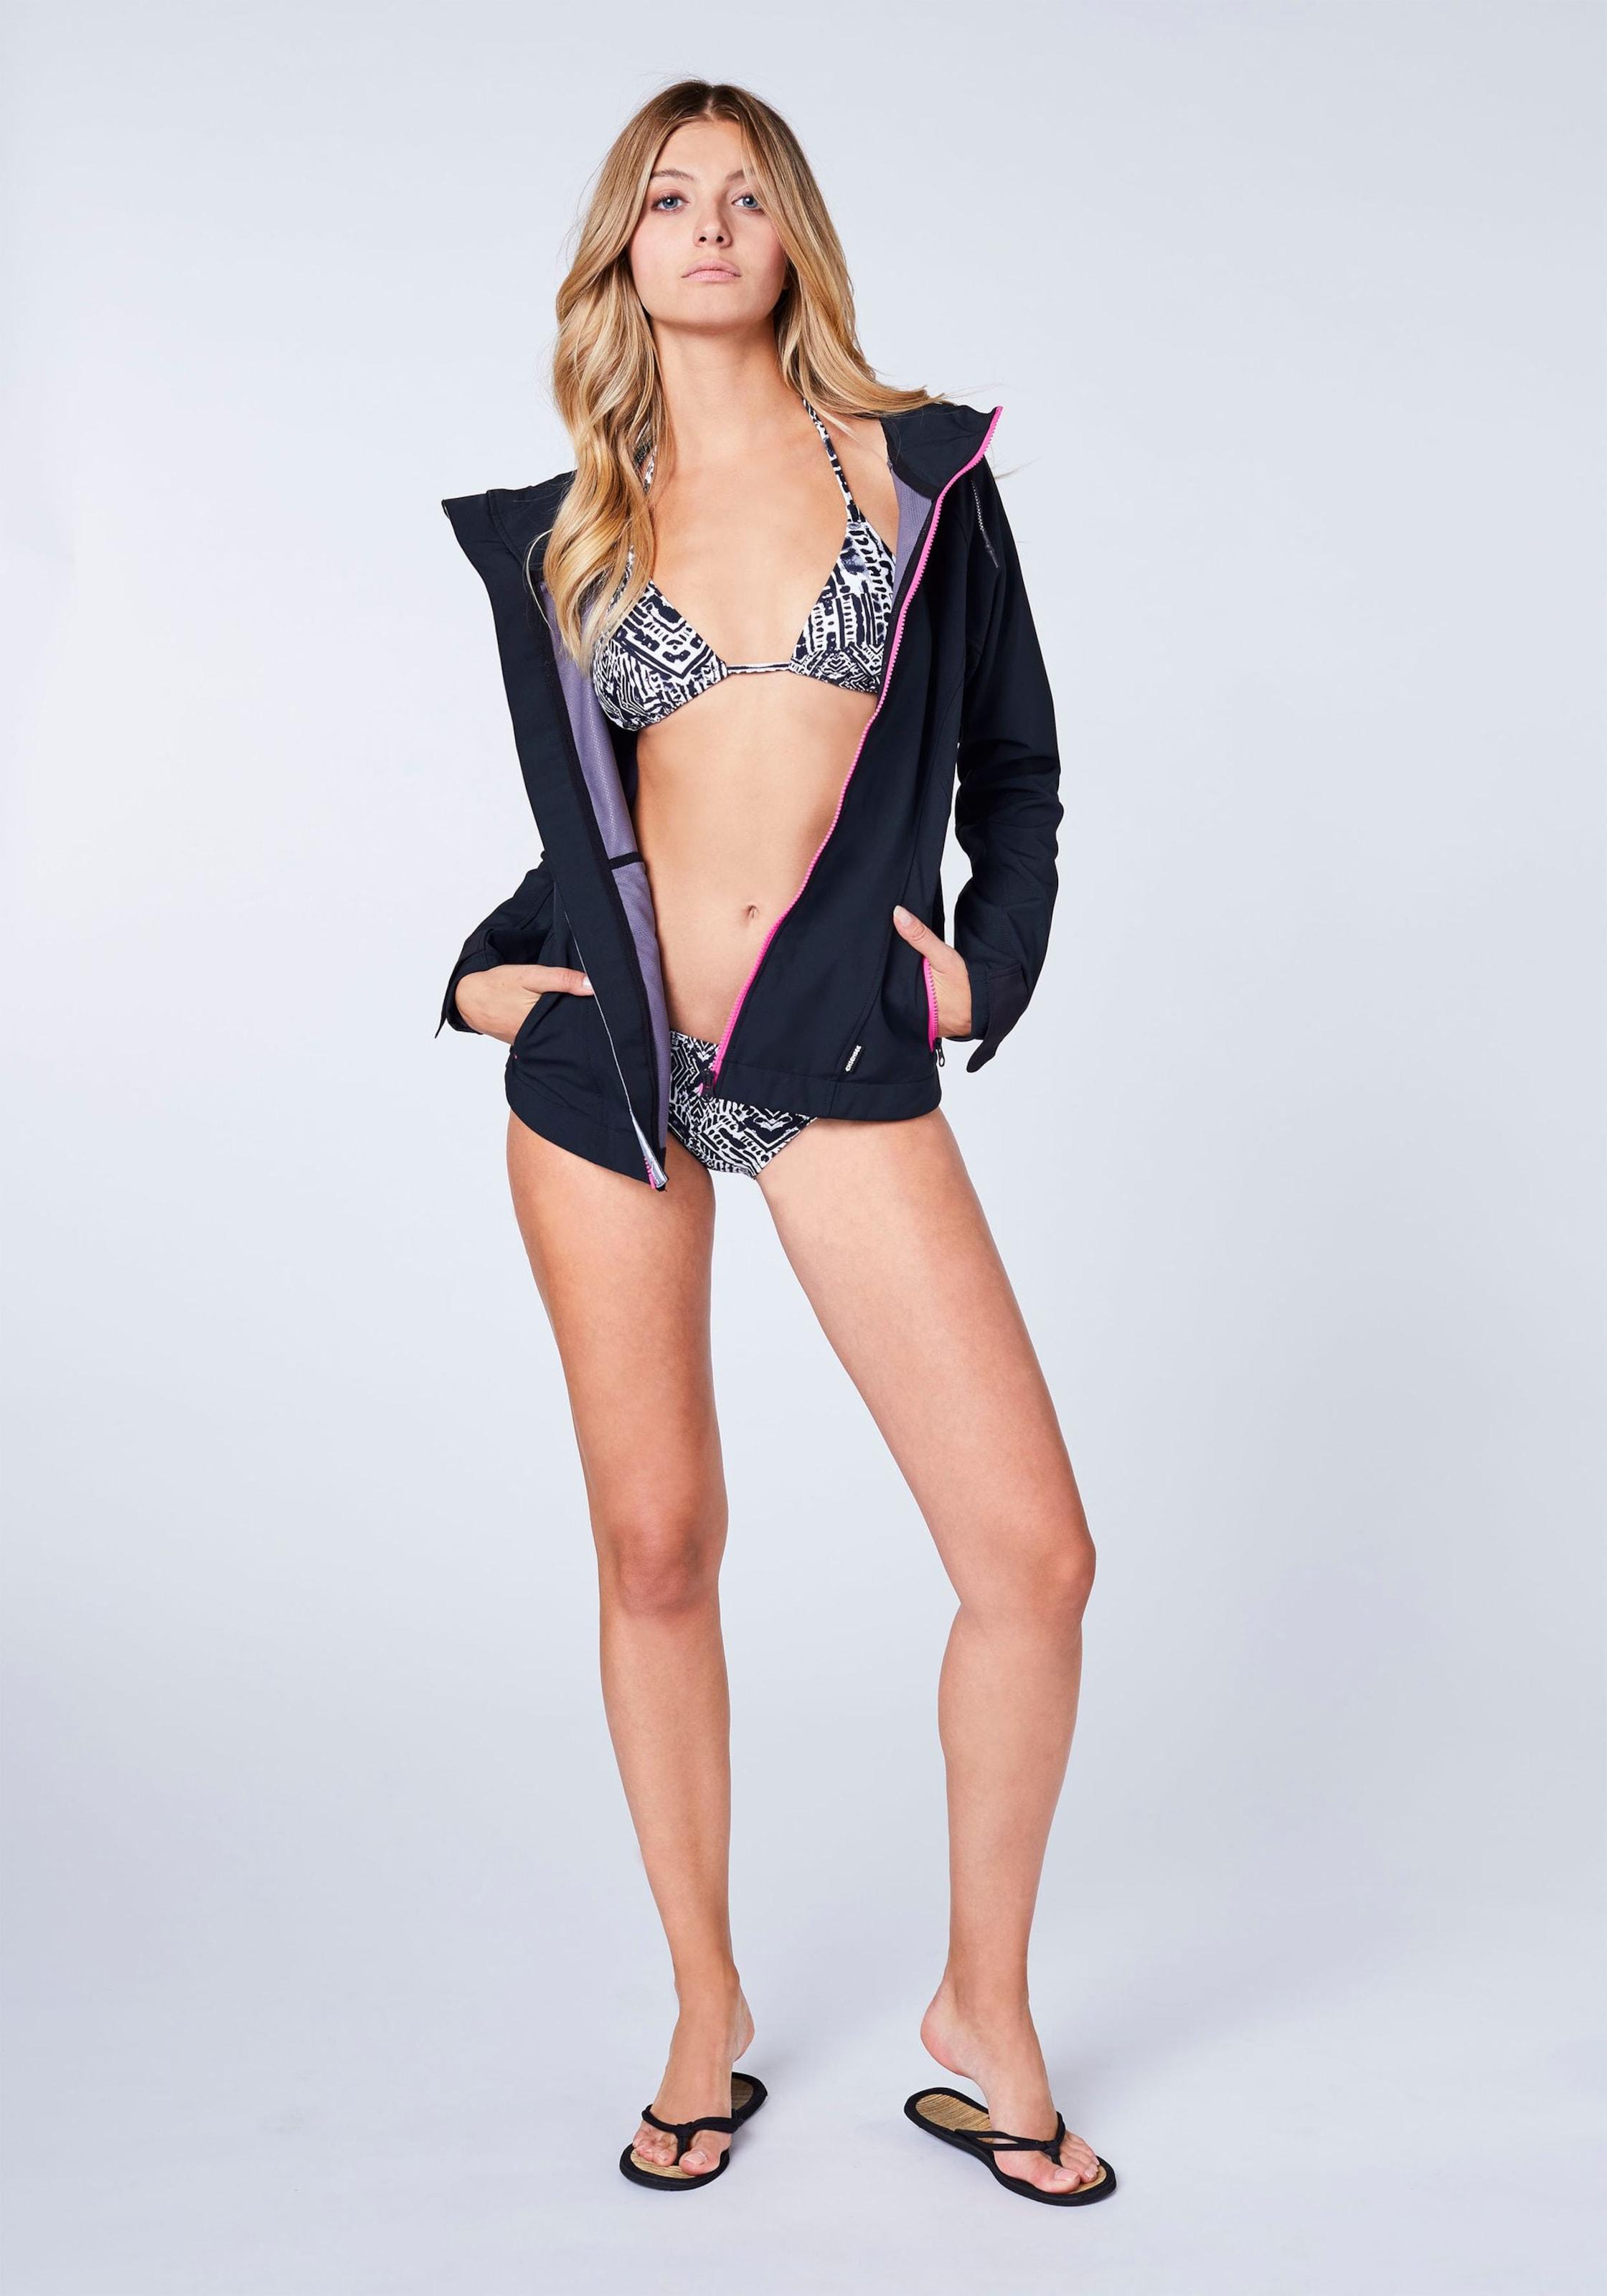 En En Chiemsee Bikini Bikini Chiemsee 'lana' BleuRose 'lana' WE92IHD